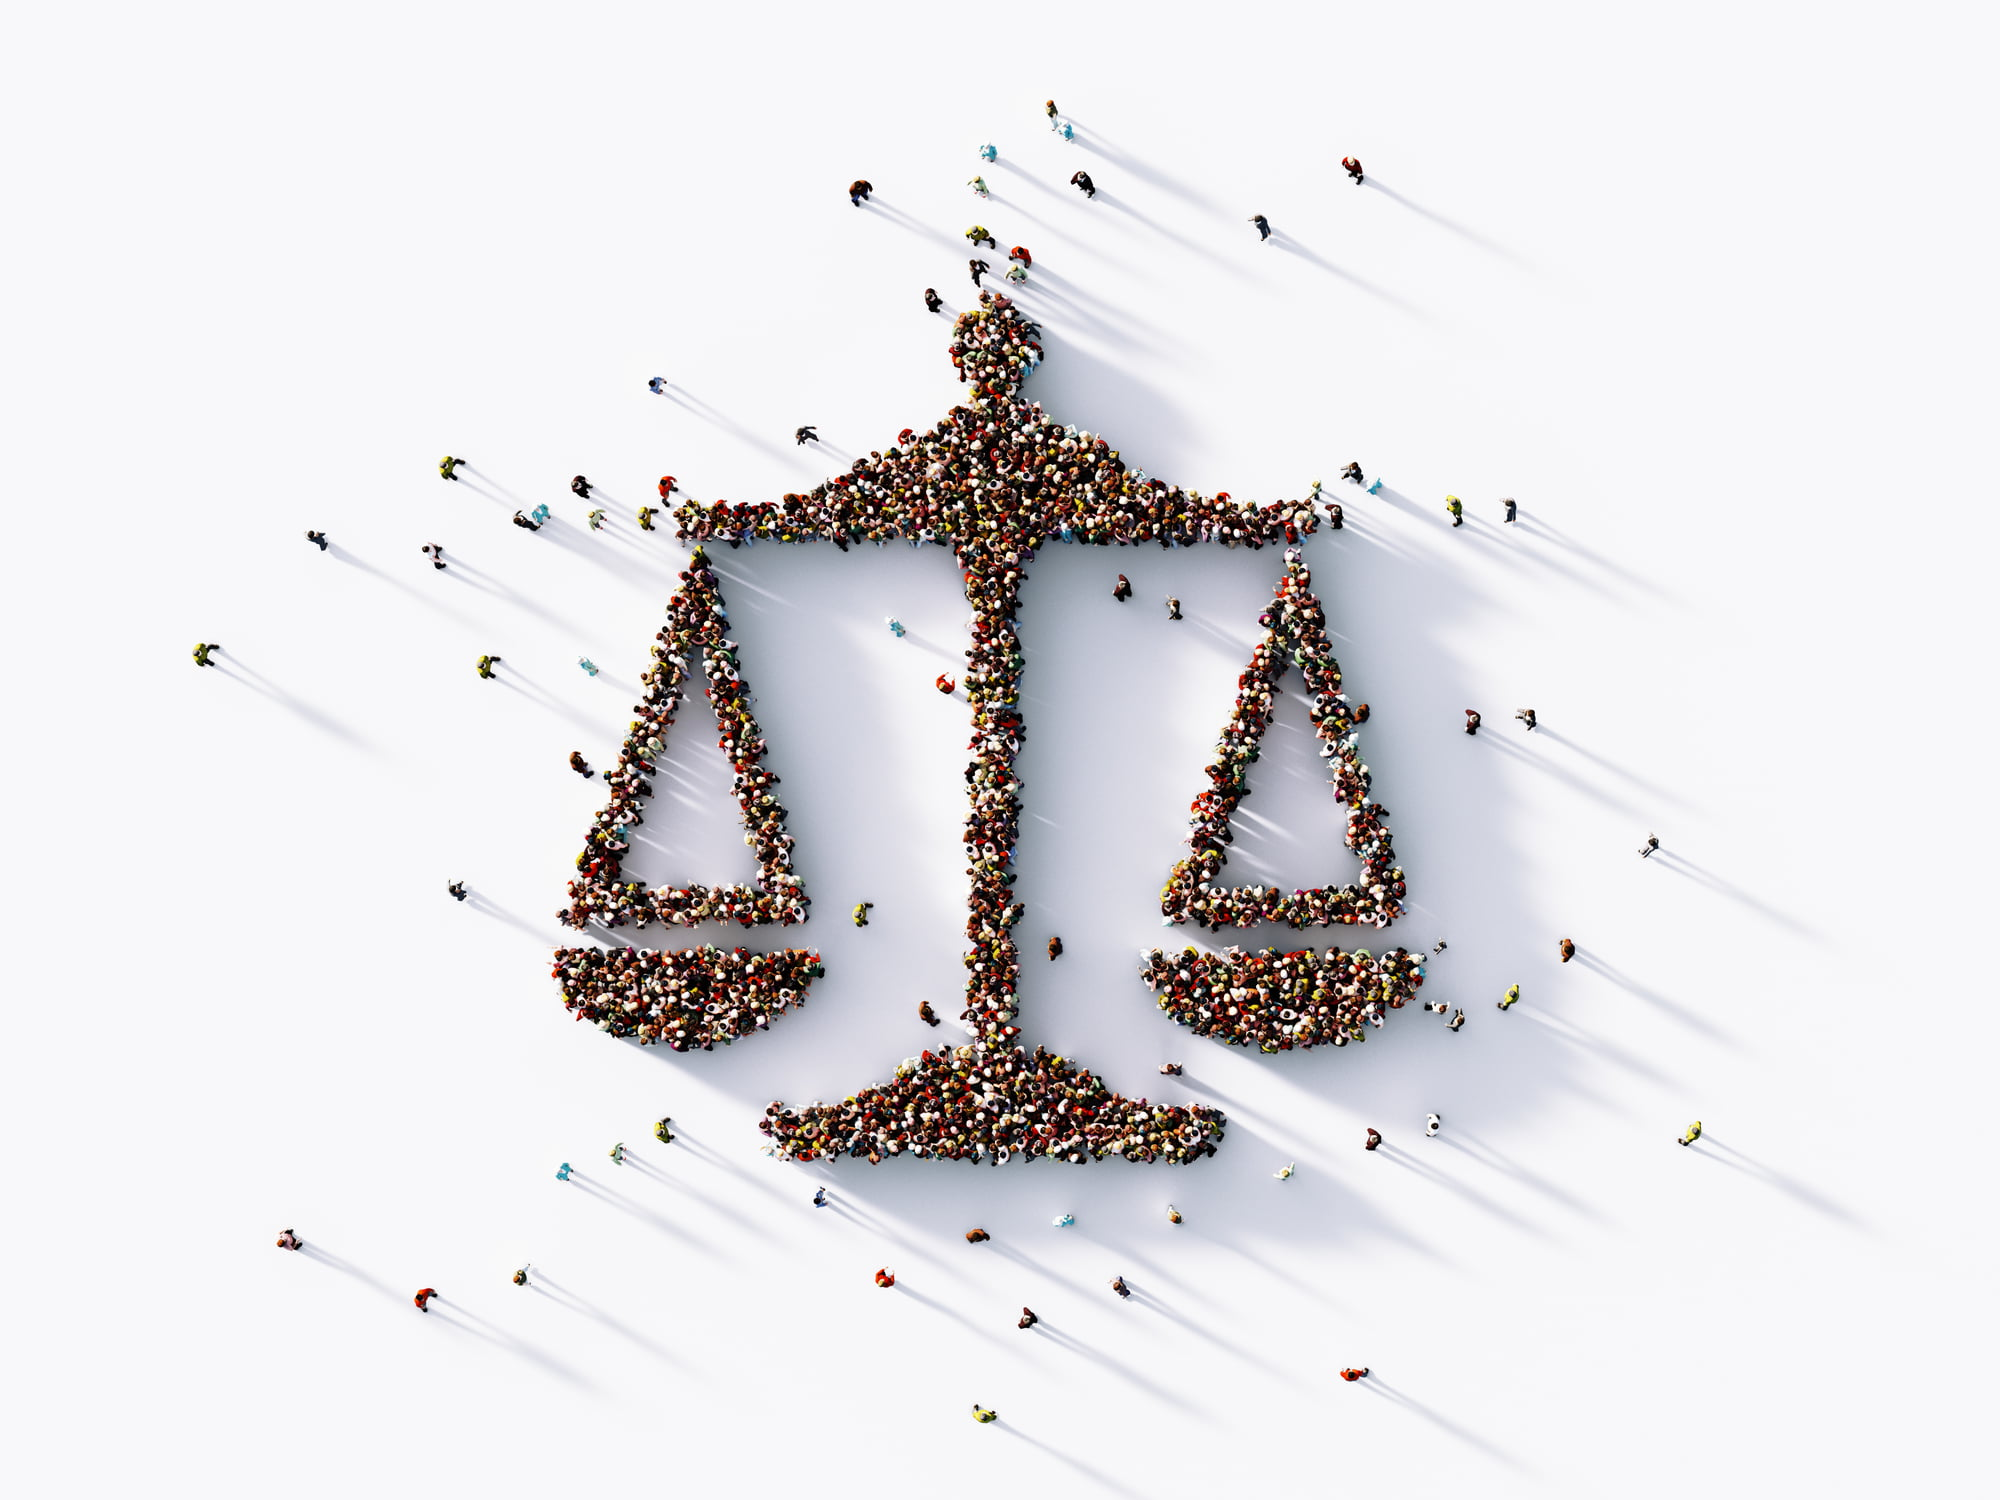 Litigation Investments